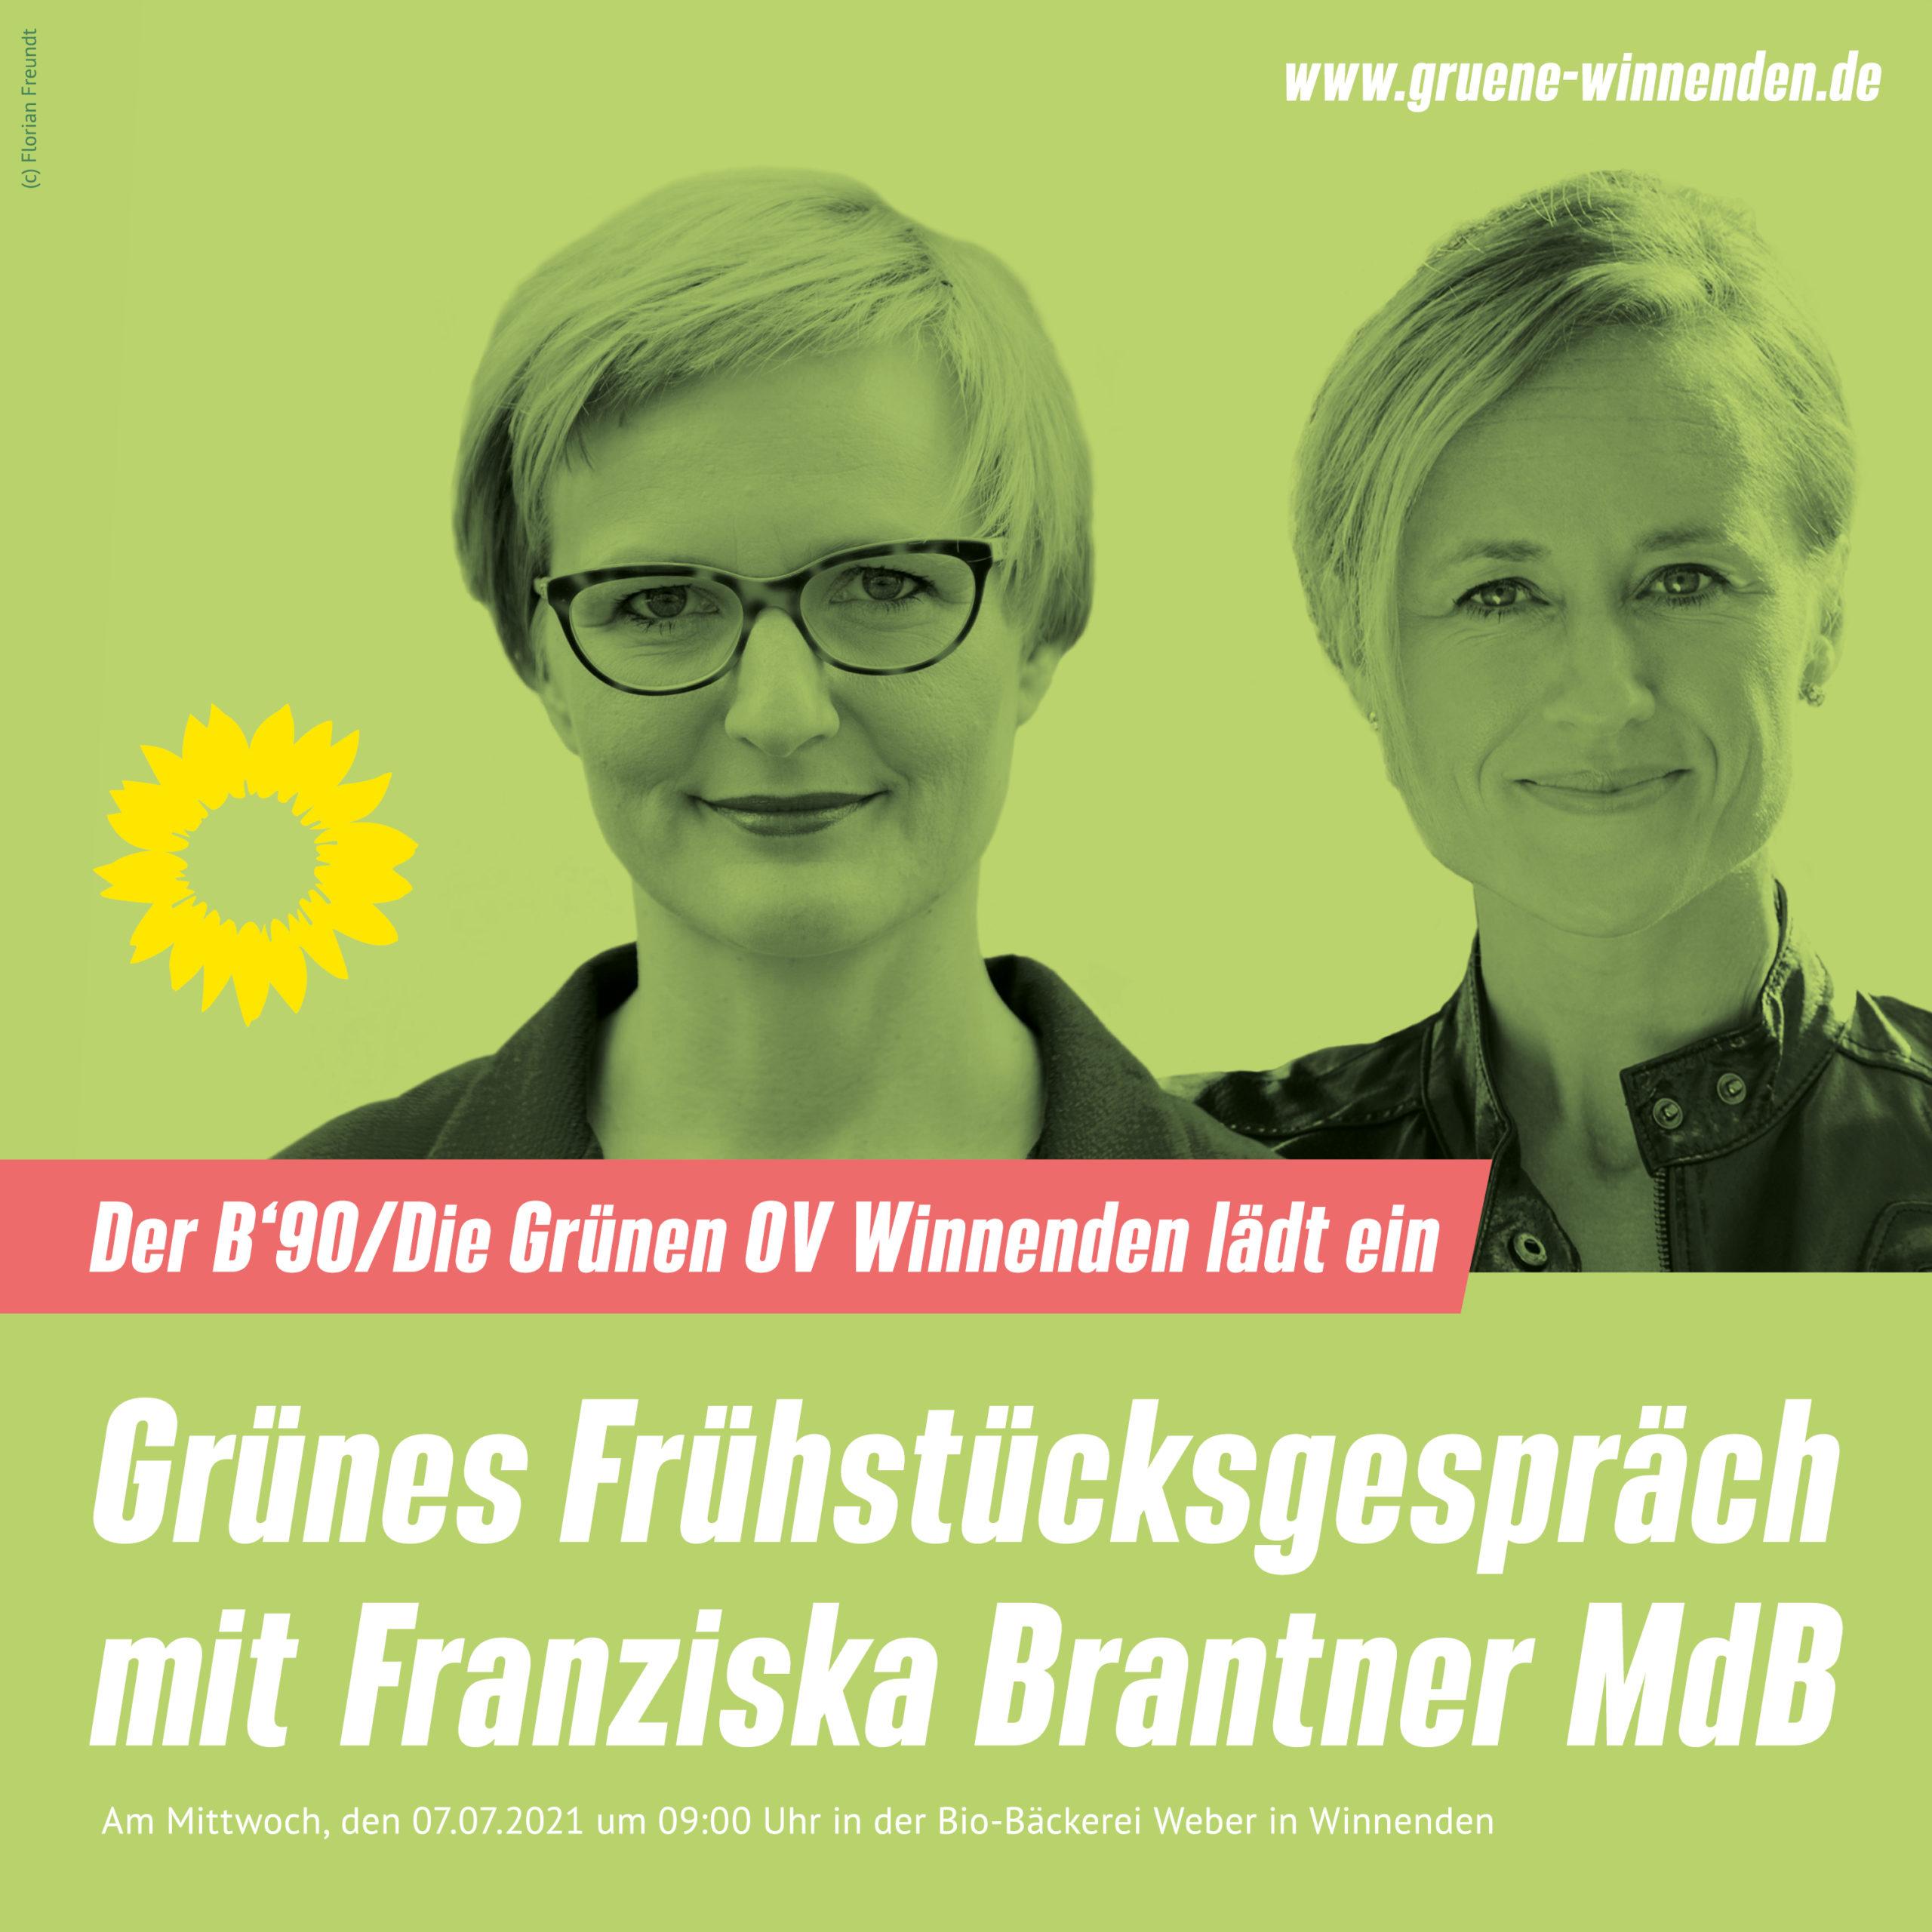 Grünes Frühstücksgespräch mit  Franziska Brantner MdB